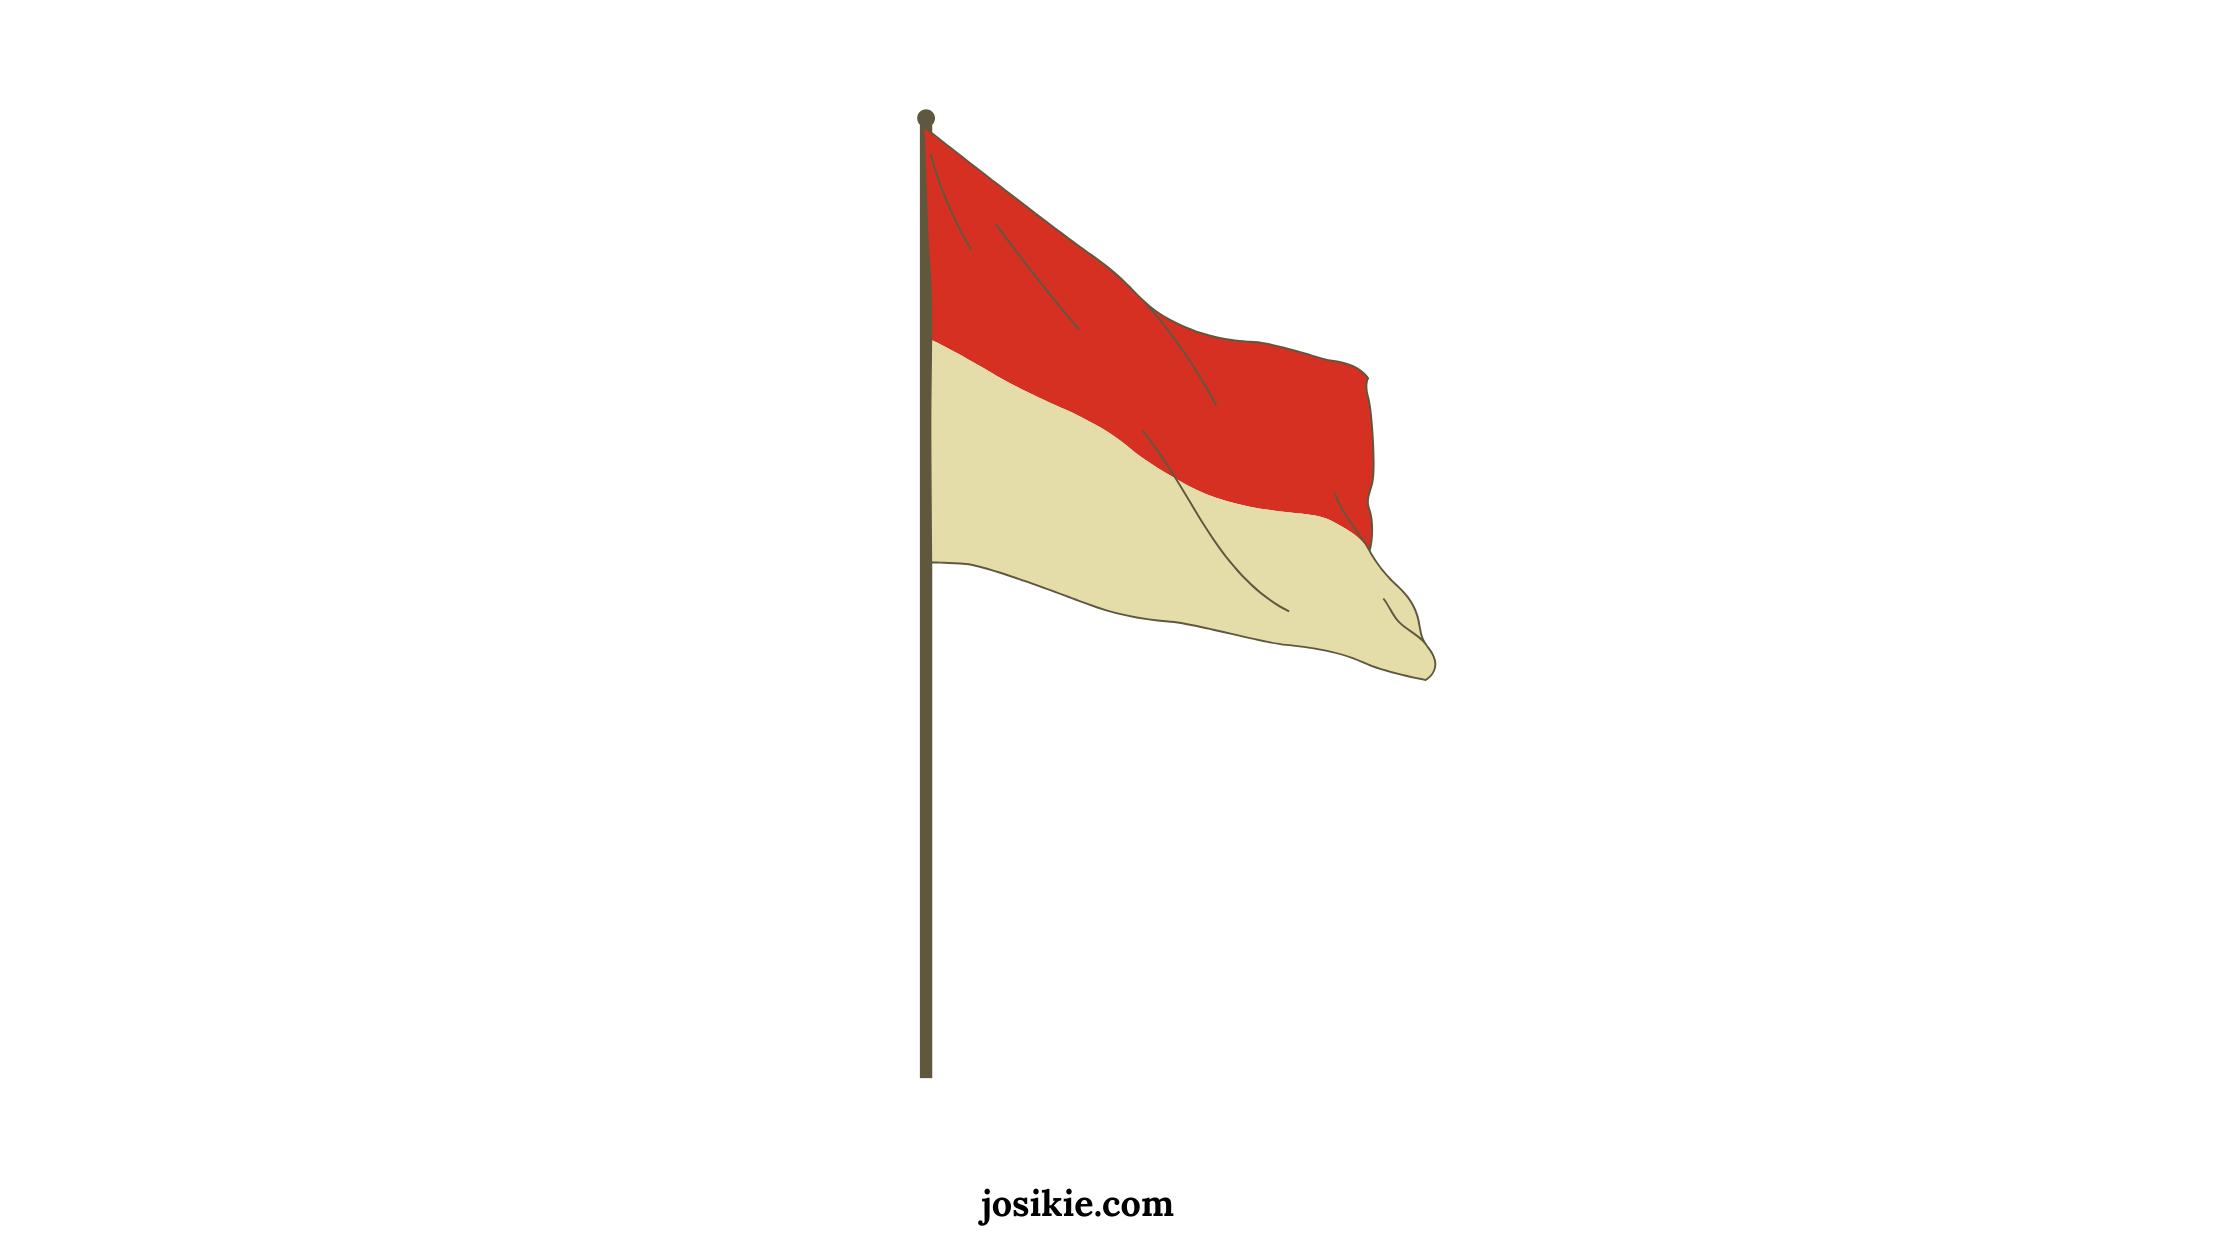 Macam - Macam Kerupuk di Indonesia